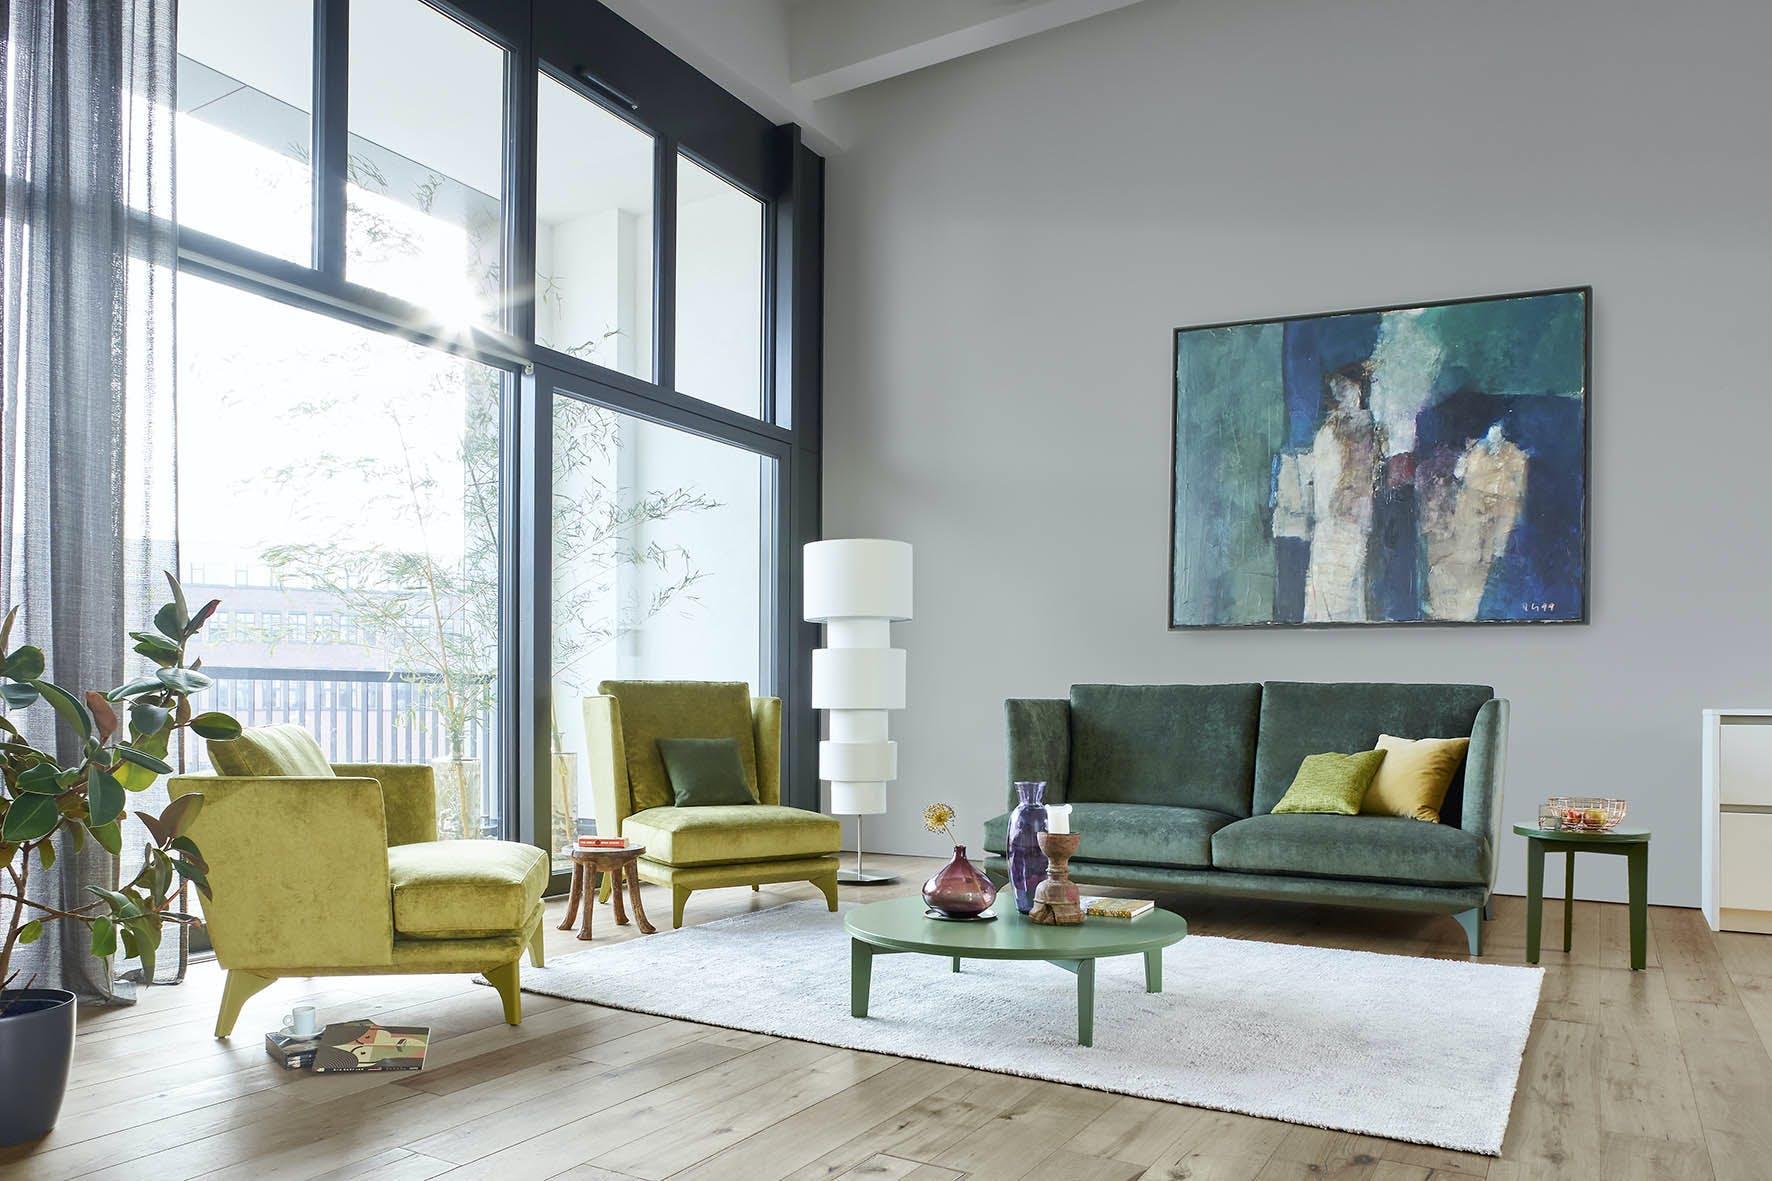 Jab Anstoetz Green Polo Lounge Sofa Insitu Haute Living